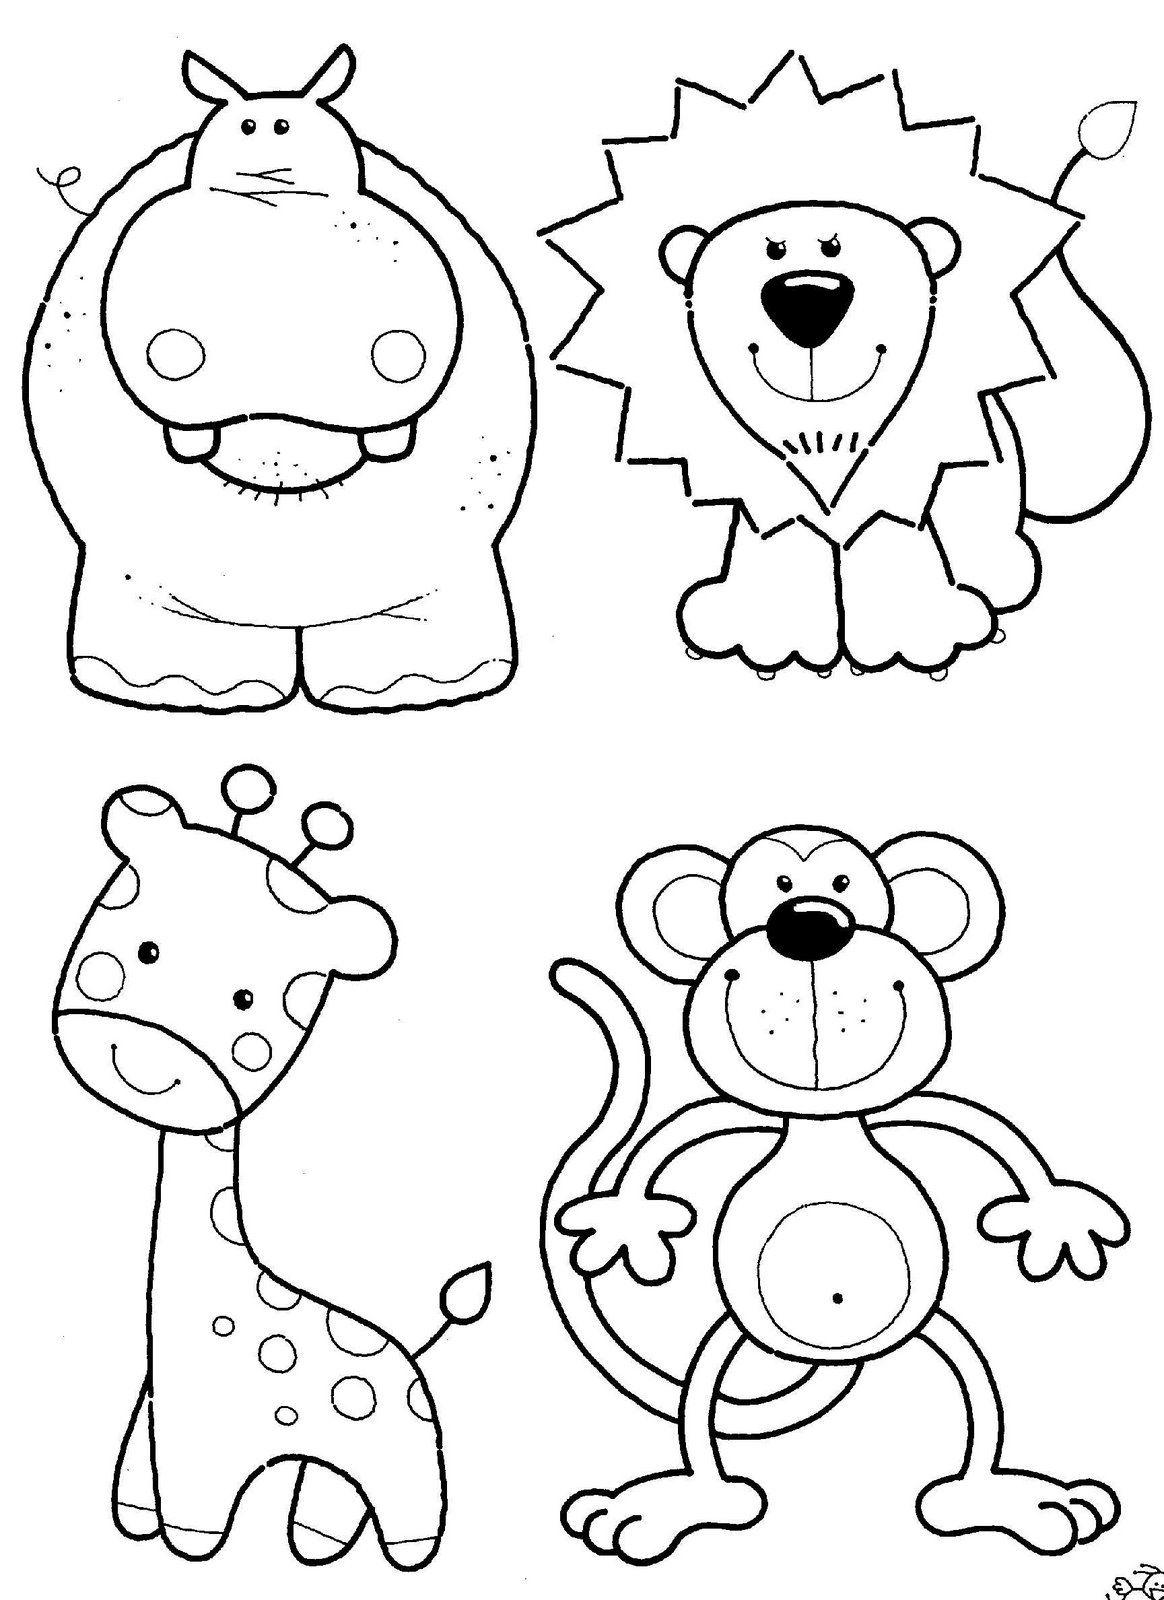 Animales selva | Dibujos | Pinterest | Servir, Espere y Molde